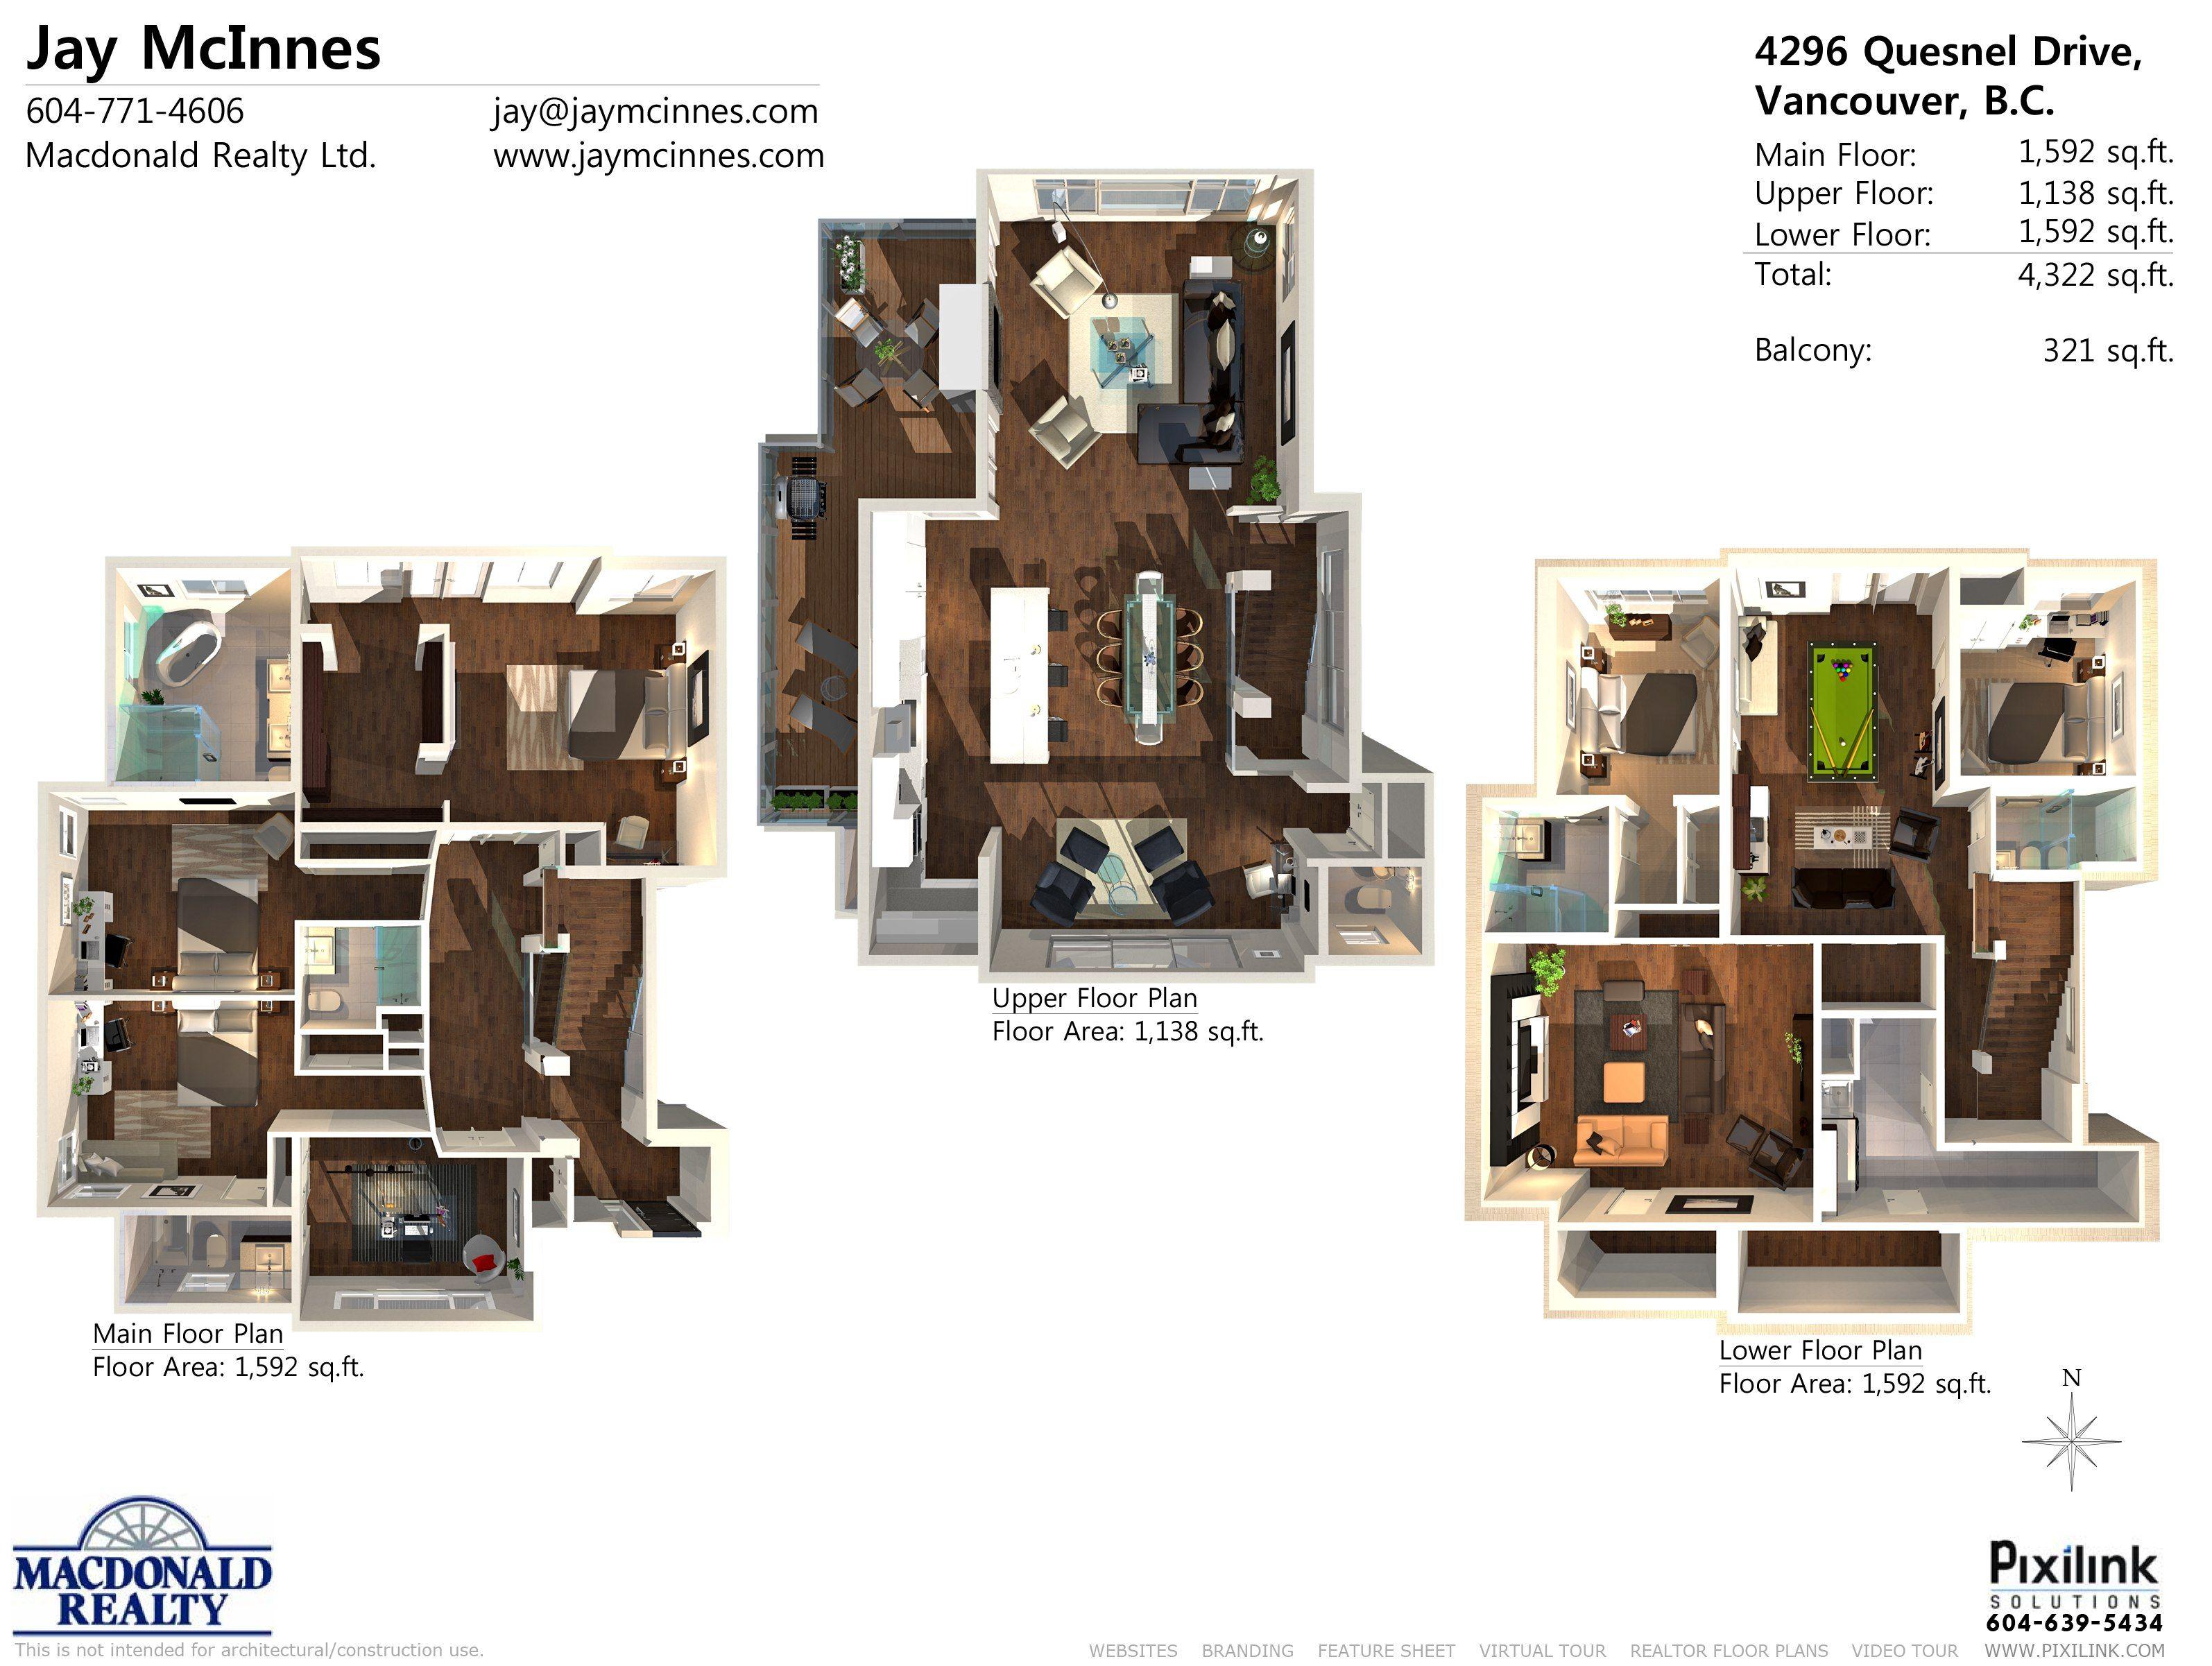 3d mansion floor plans - Google Search | Mansion floor ...